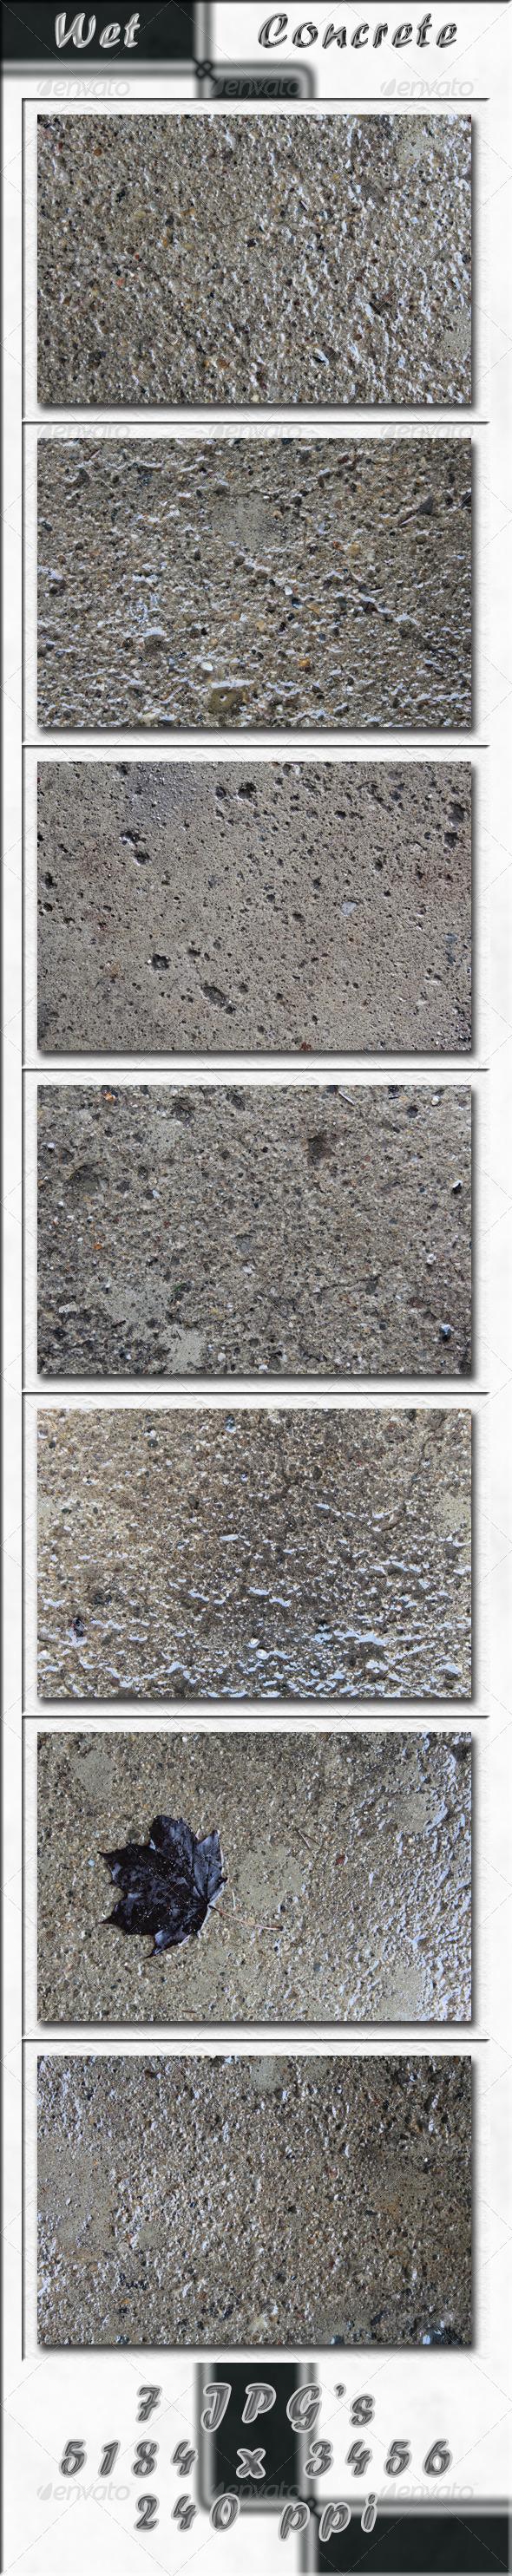 GraphicRiver Wet Concrete 4235688